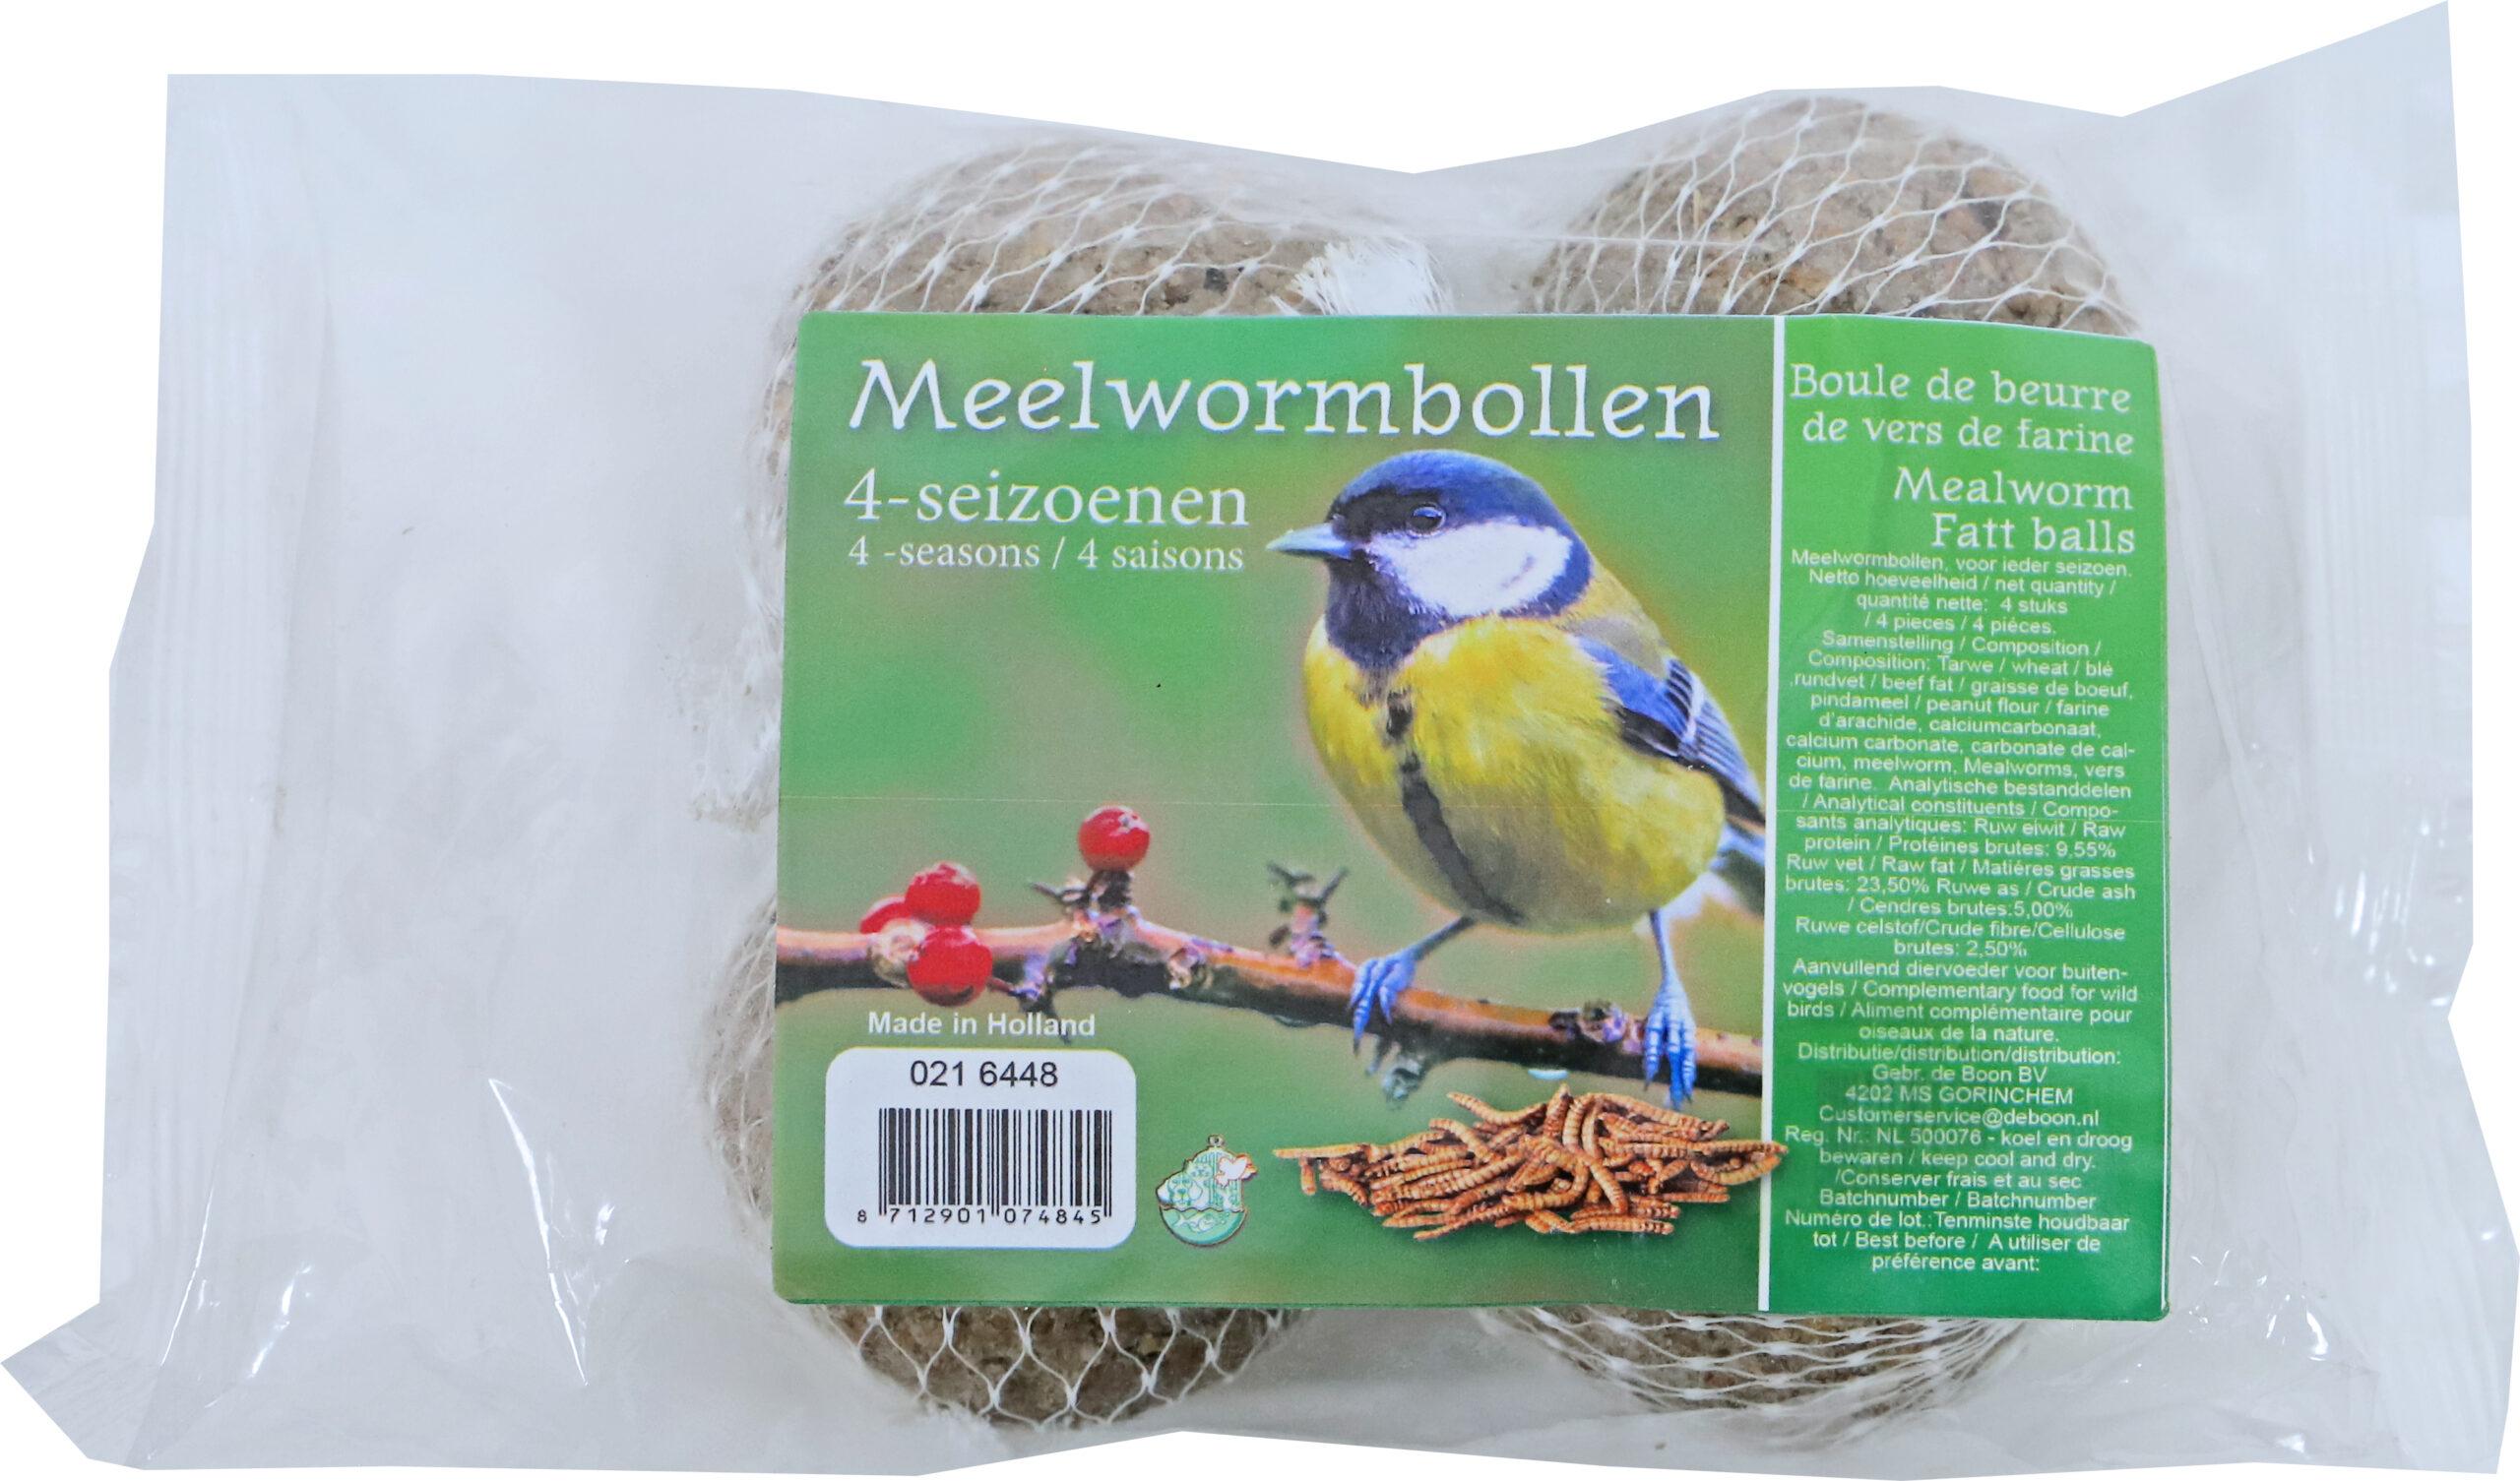 Boon Meelwormbollen 4 Seizoenen